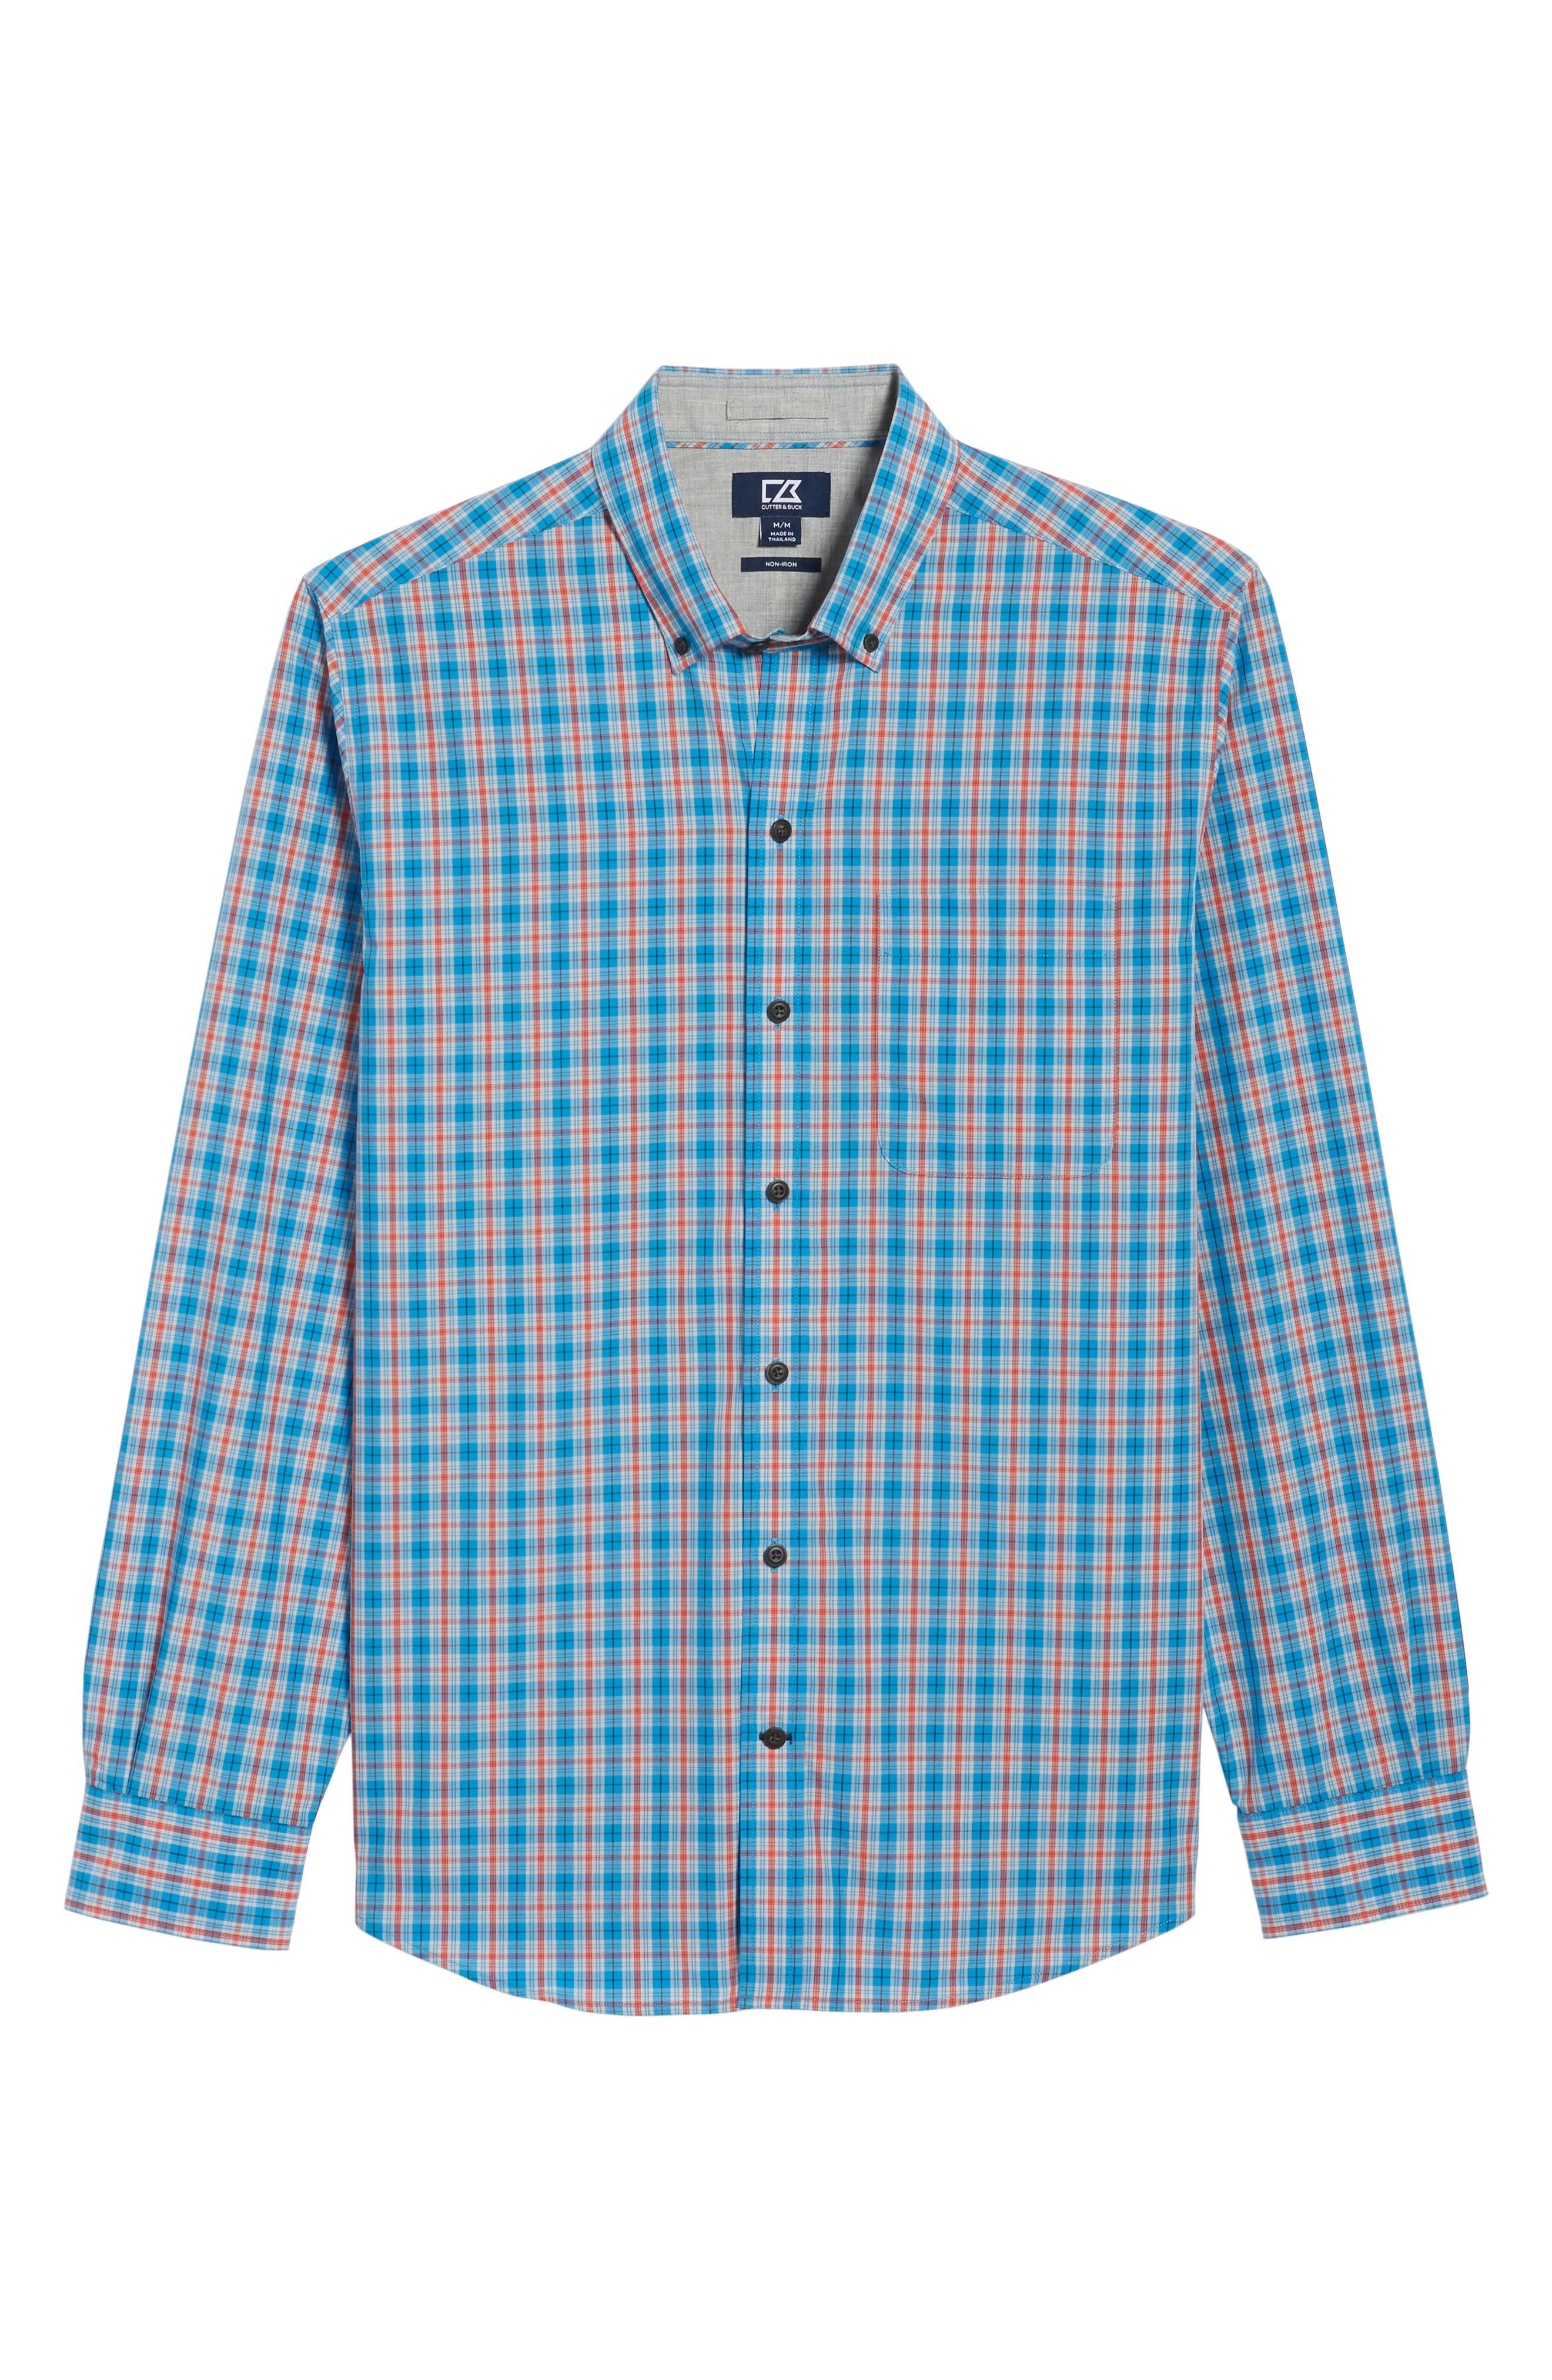 Landon Classic Fit Non-Iron Plaid Sport Shirt,                             Alternate thumbnail 6, color,                             POOLSIDE